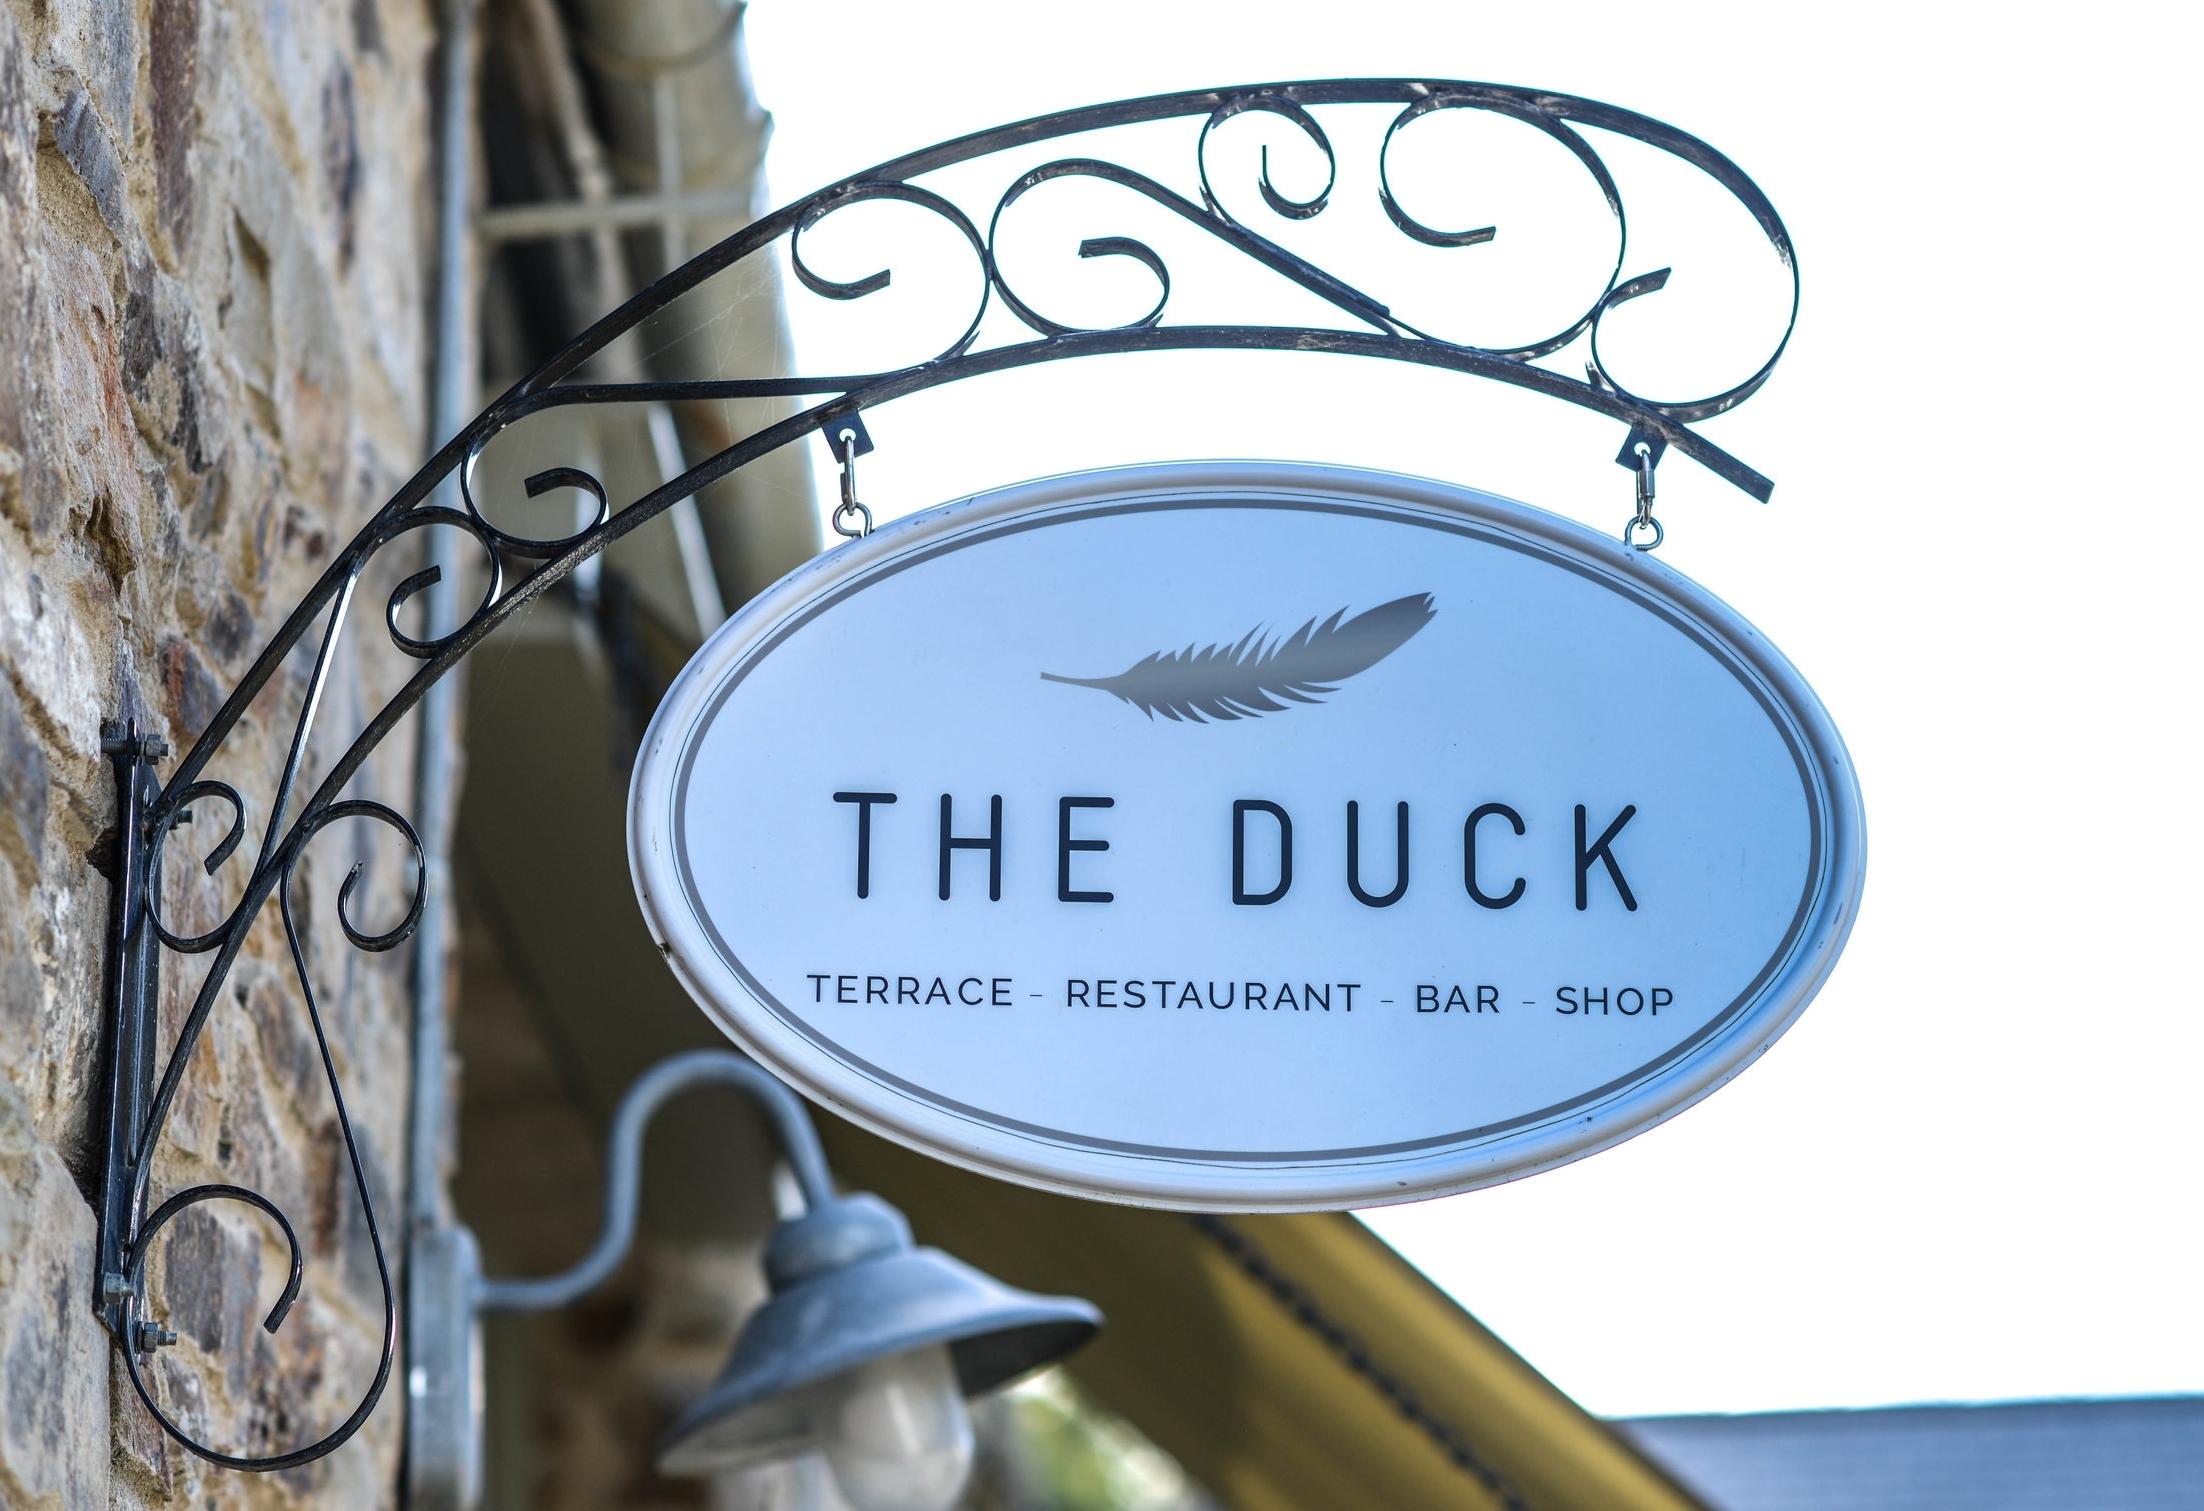 The_Duck_Marfield_House_Weston_Table.jpg